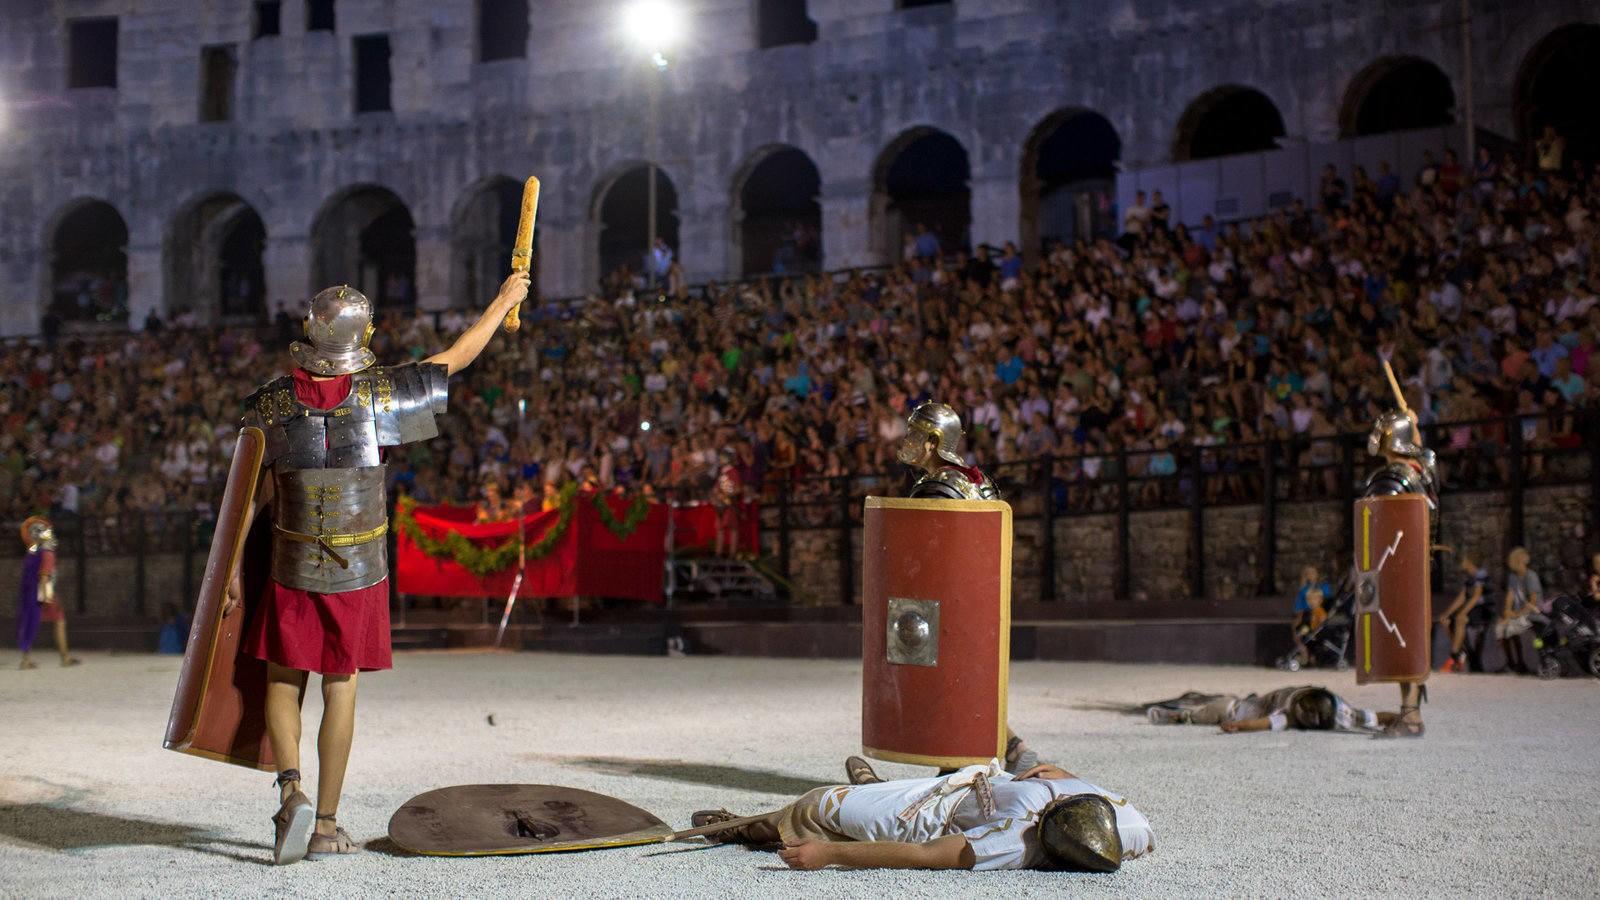 Spectacvla Antiqva gladiatoren gevecht Pula